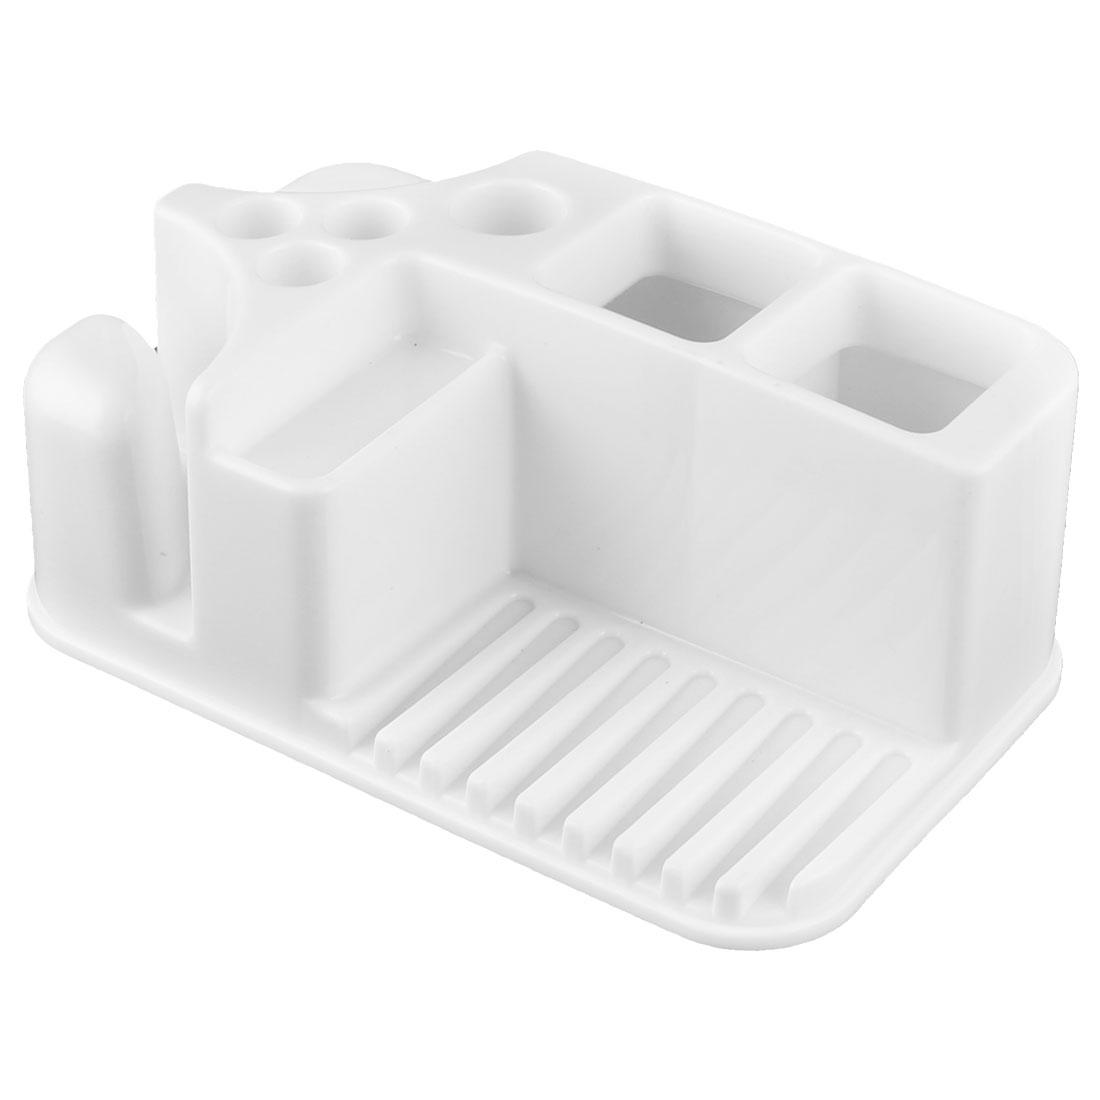 Household Bathroom Plastic Toothbrush Toothpaste Soap Storage Shelves Rack White